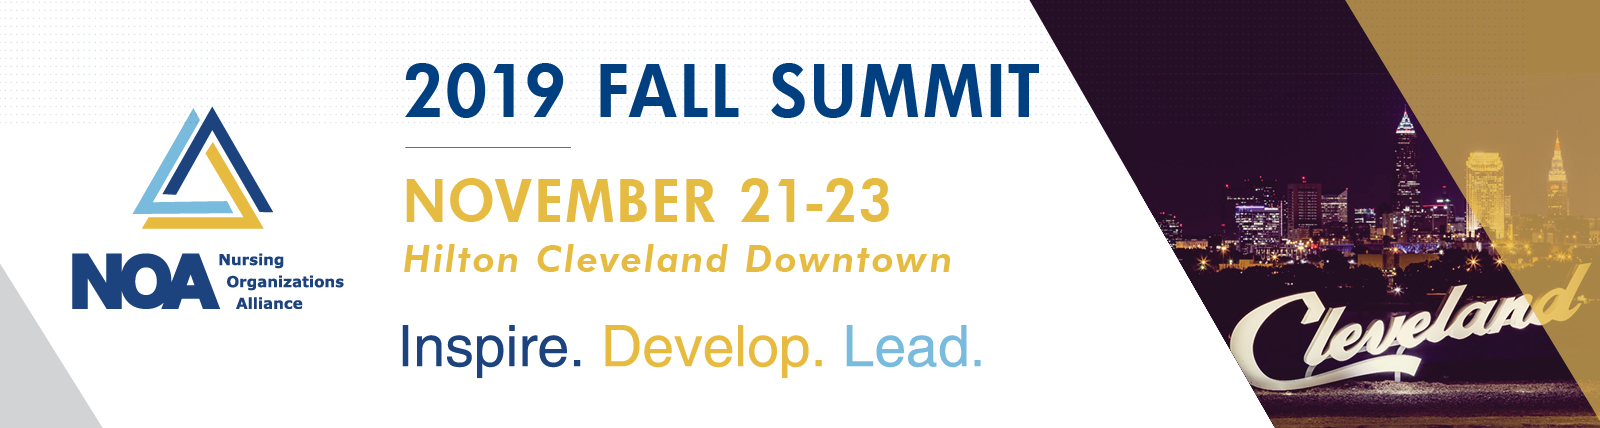 2019 NOA Fall Summit Exhibitor & Sponsor Registration